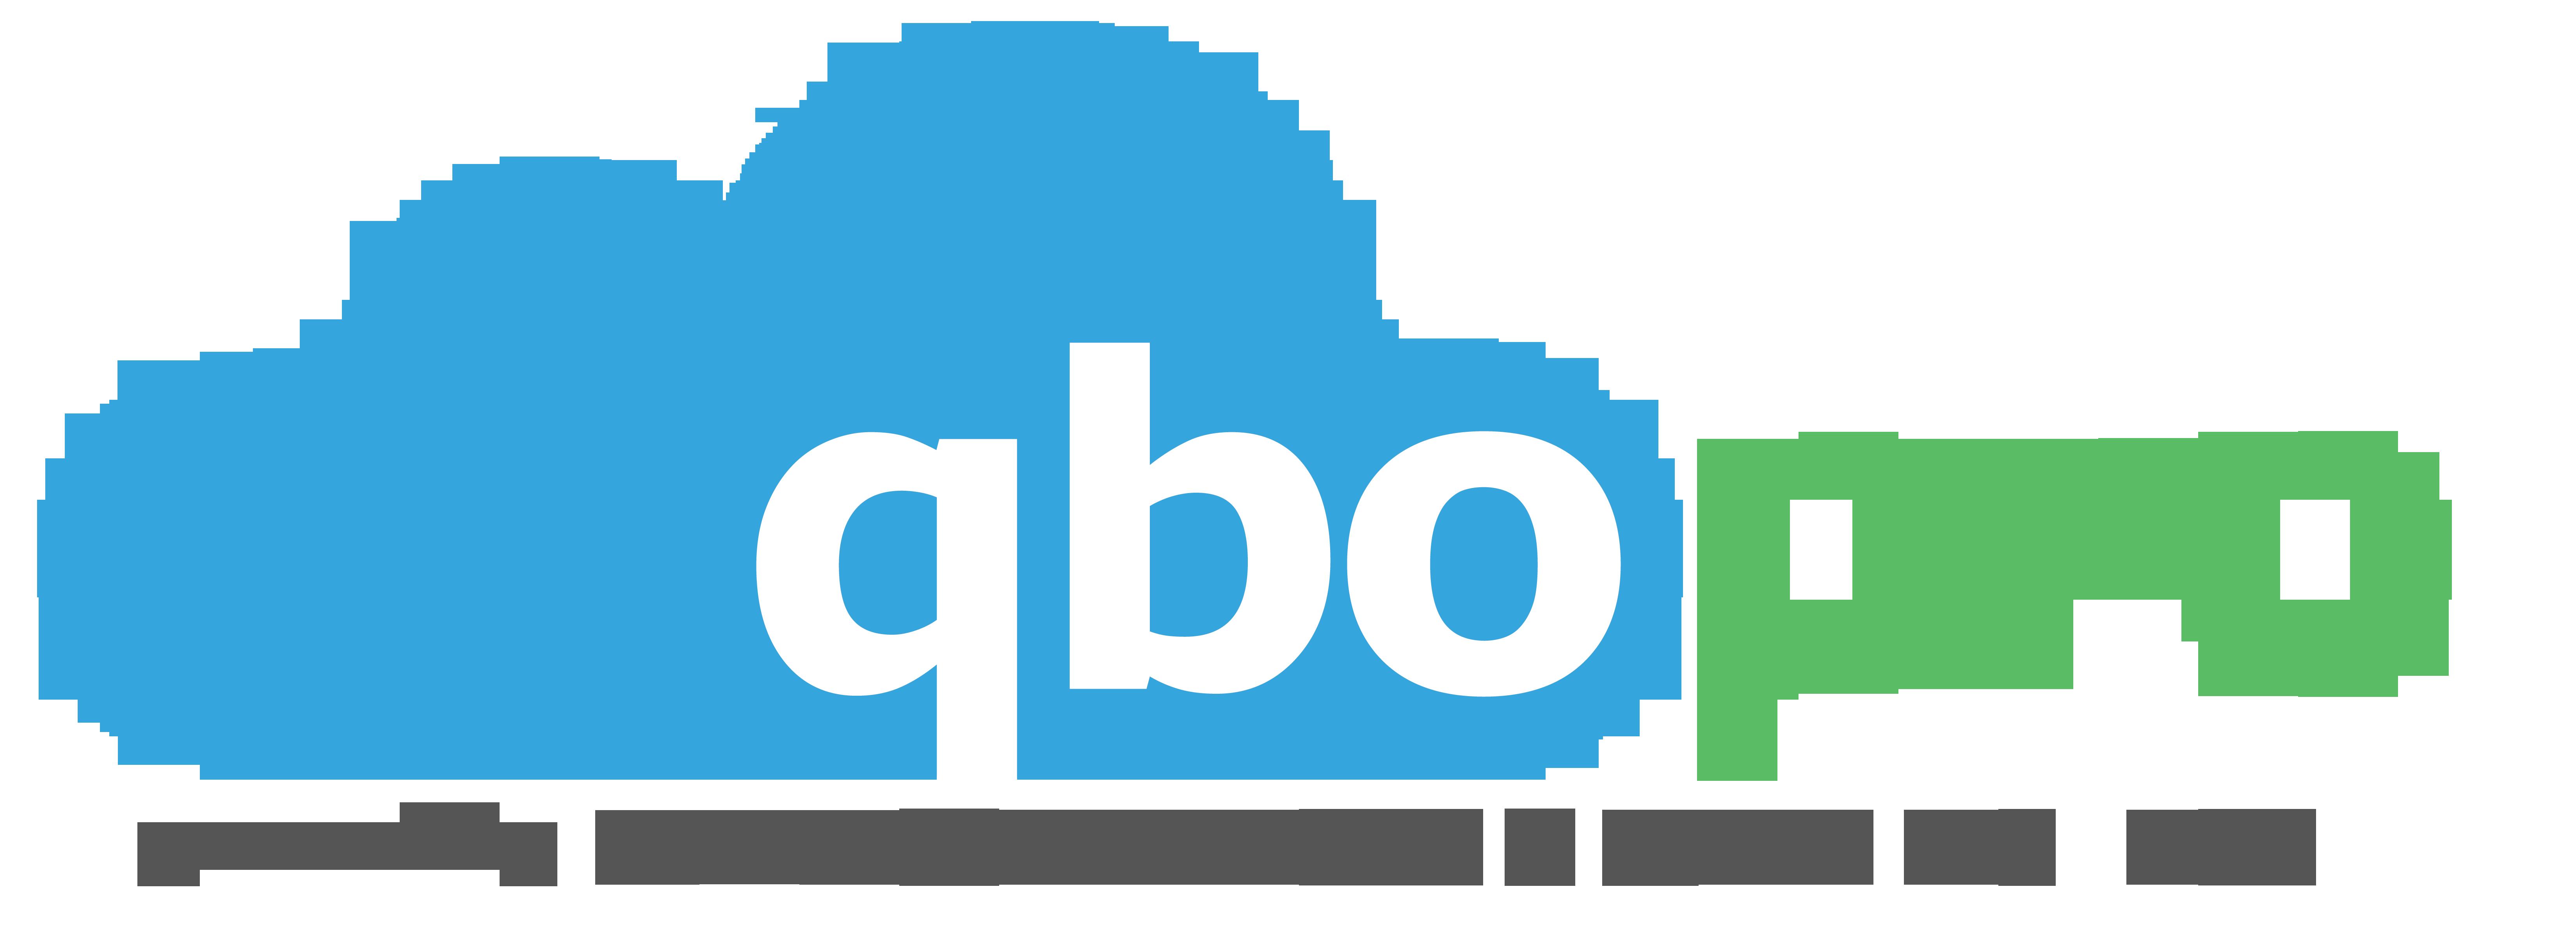 Quickbooks online Logos